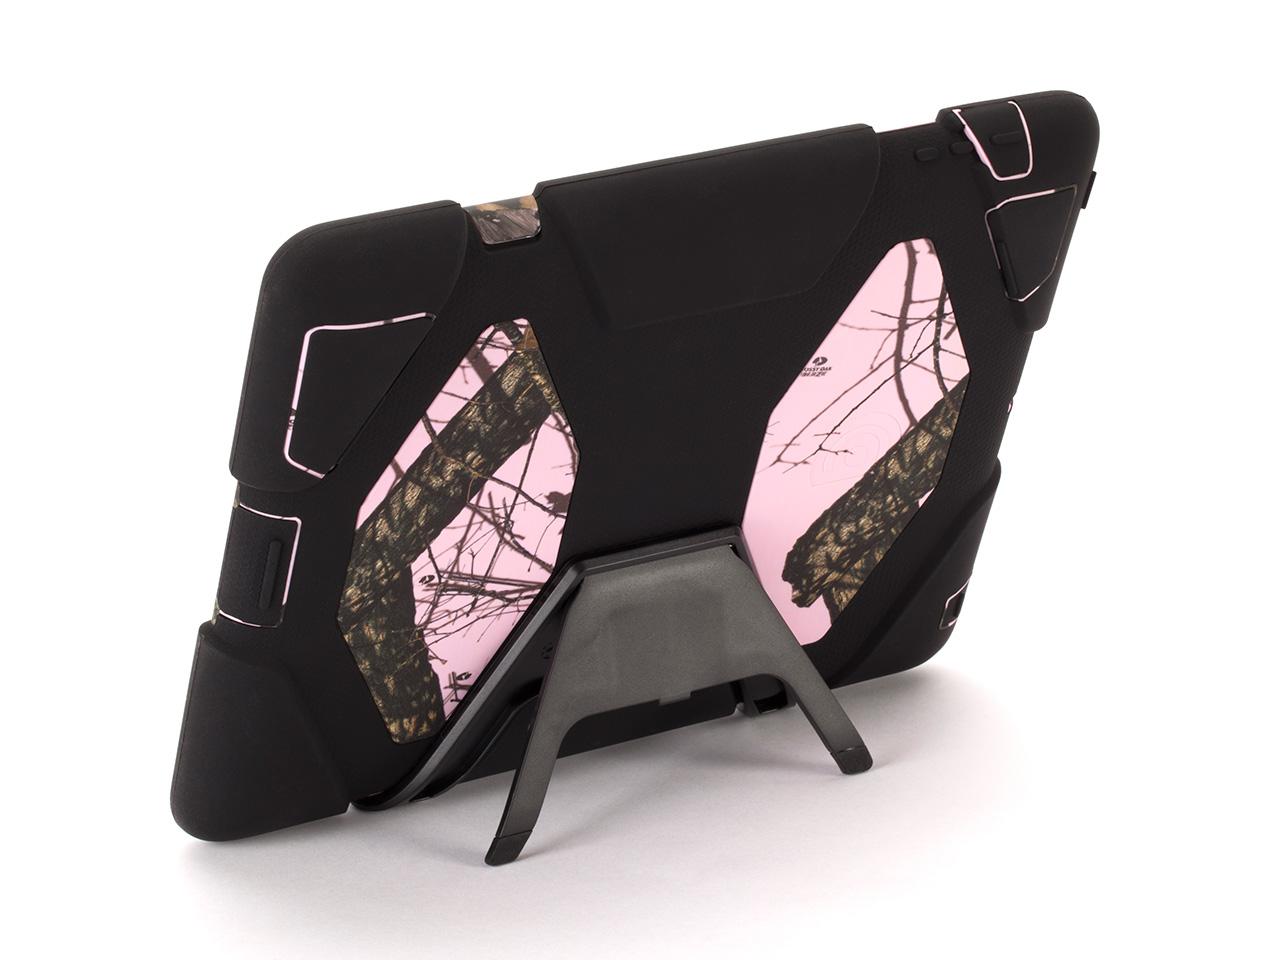 Pink Breakup/ Black Survivor All-Terrain in Mossy Oak Camo + Stand for iPad 2